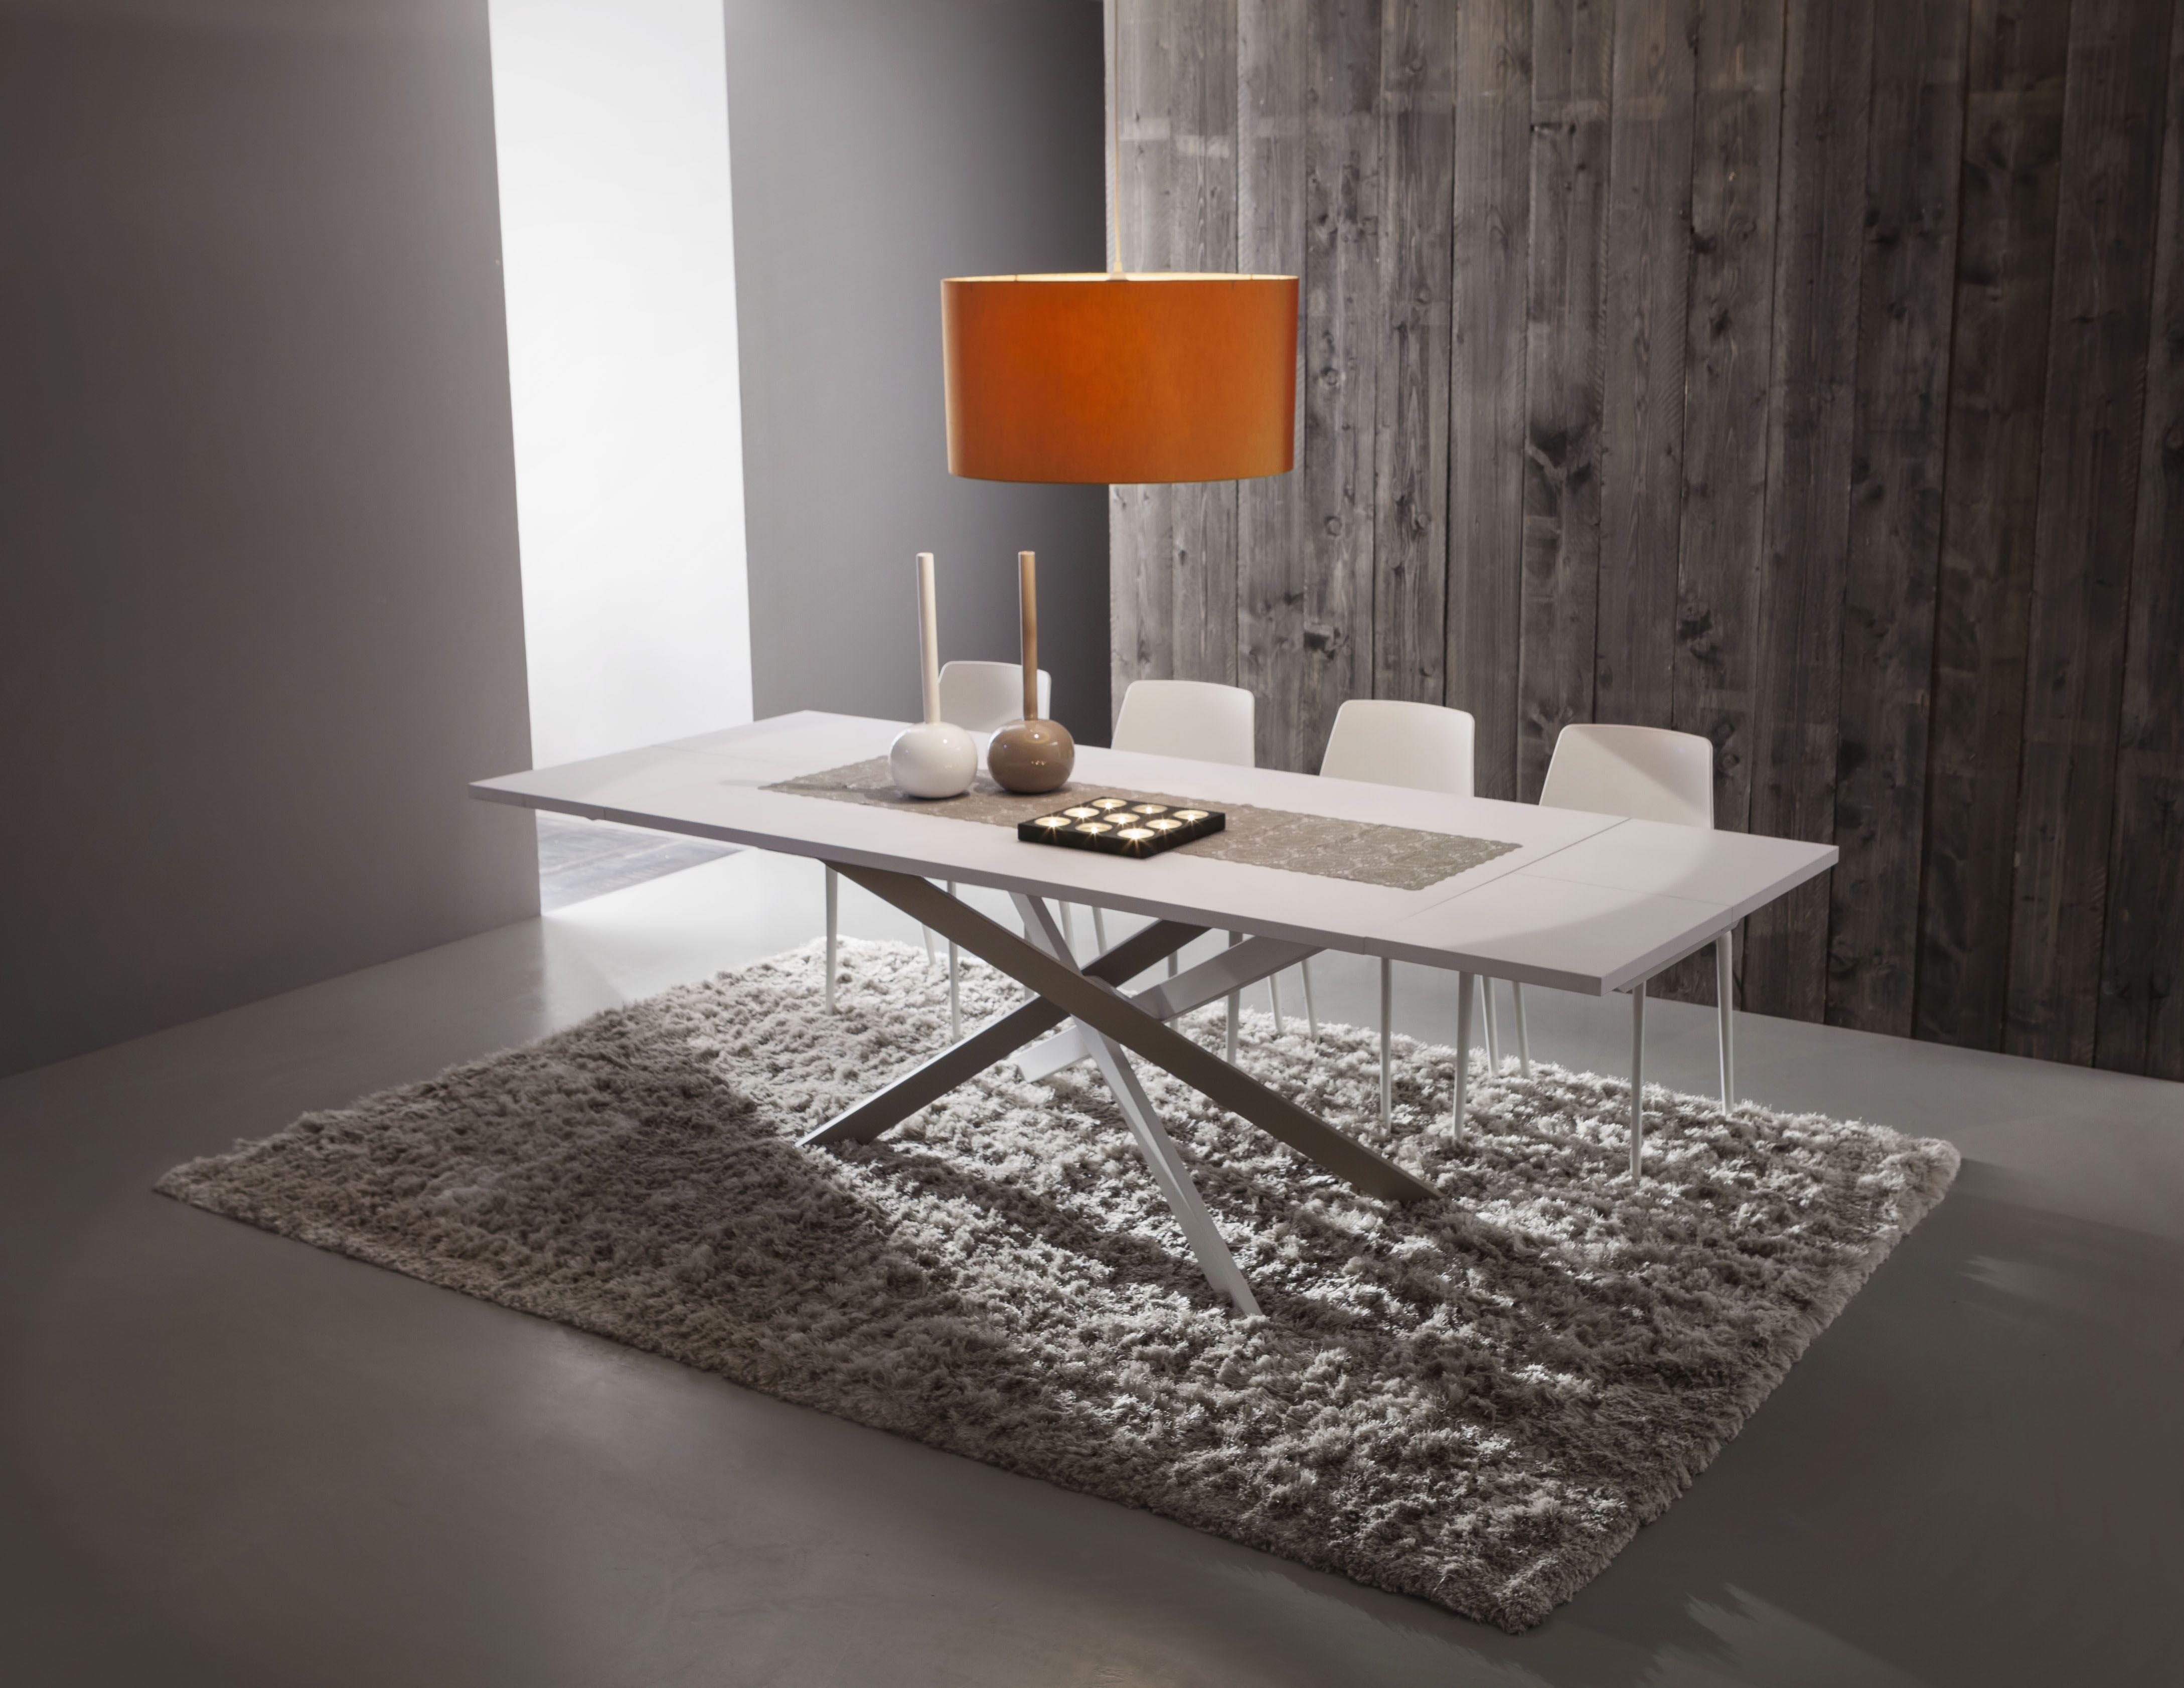 Tavolo Renzo ~ Renzo τραπέζι ανοιγόμενο ή σταθερό με επιφάνεια απο fenix ή ξύλο